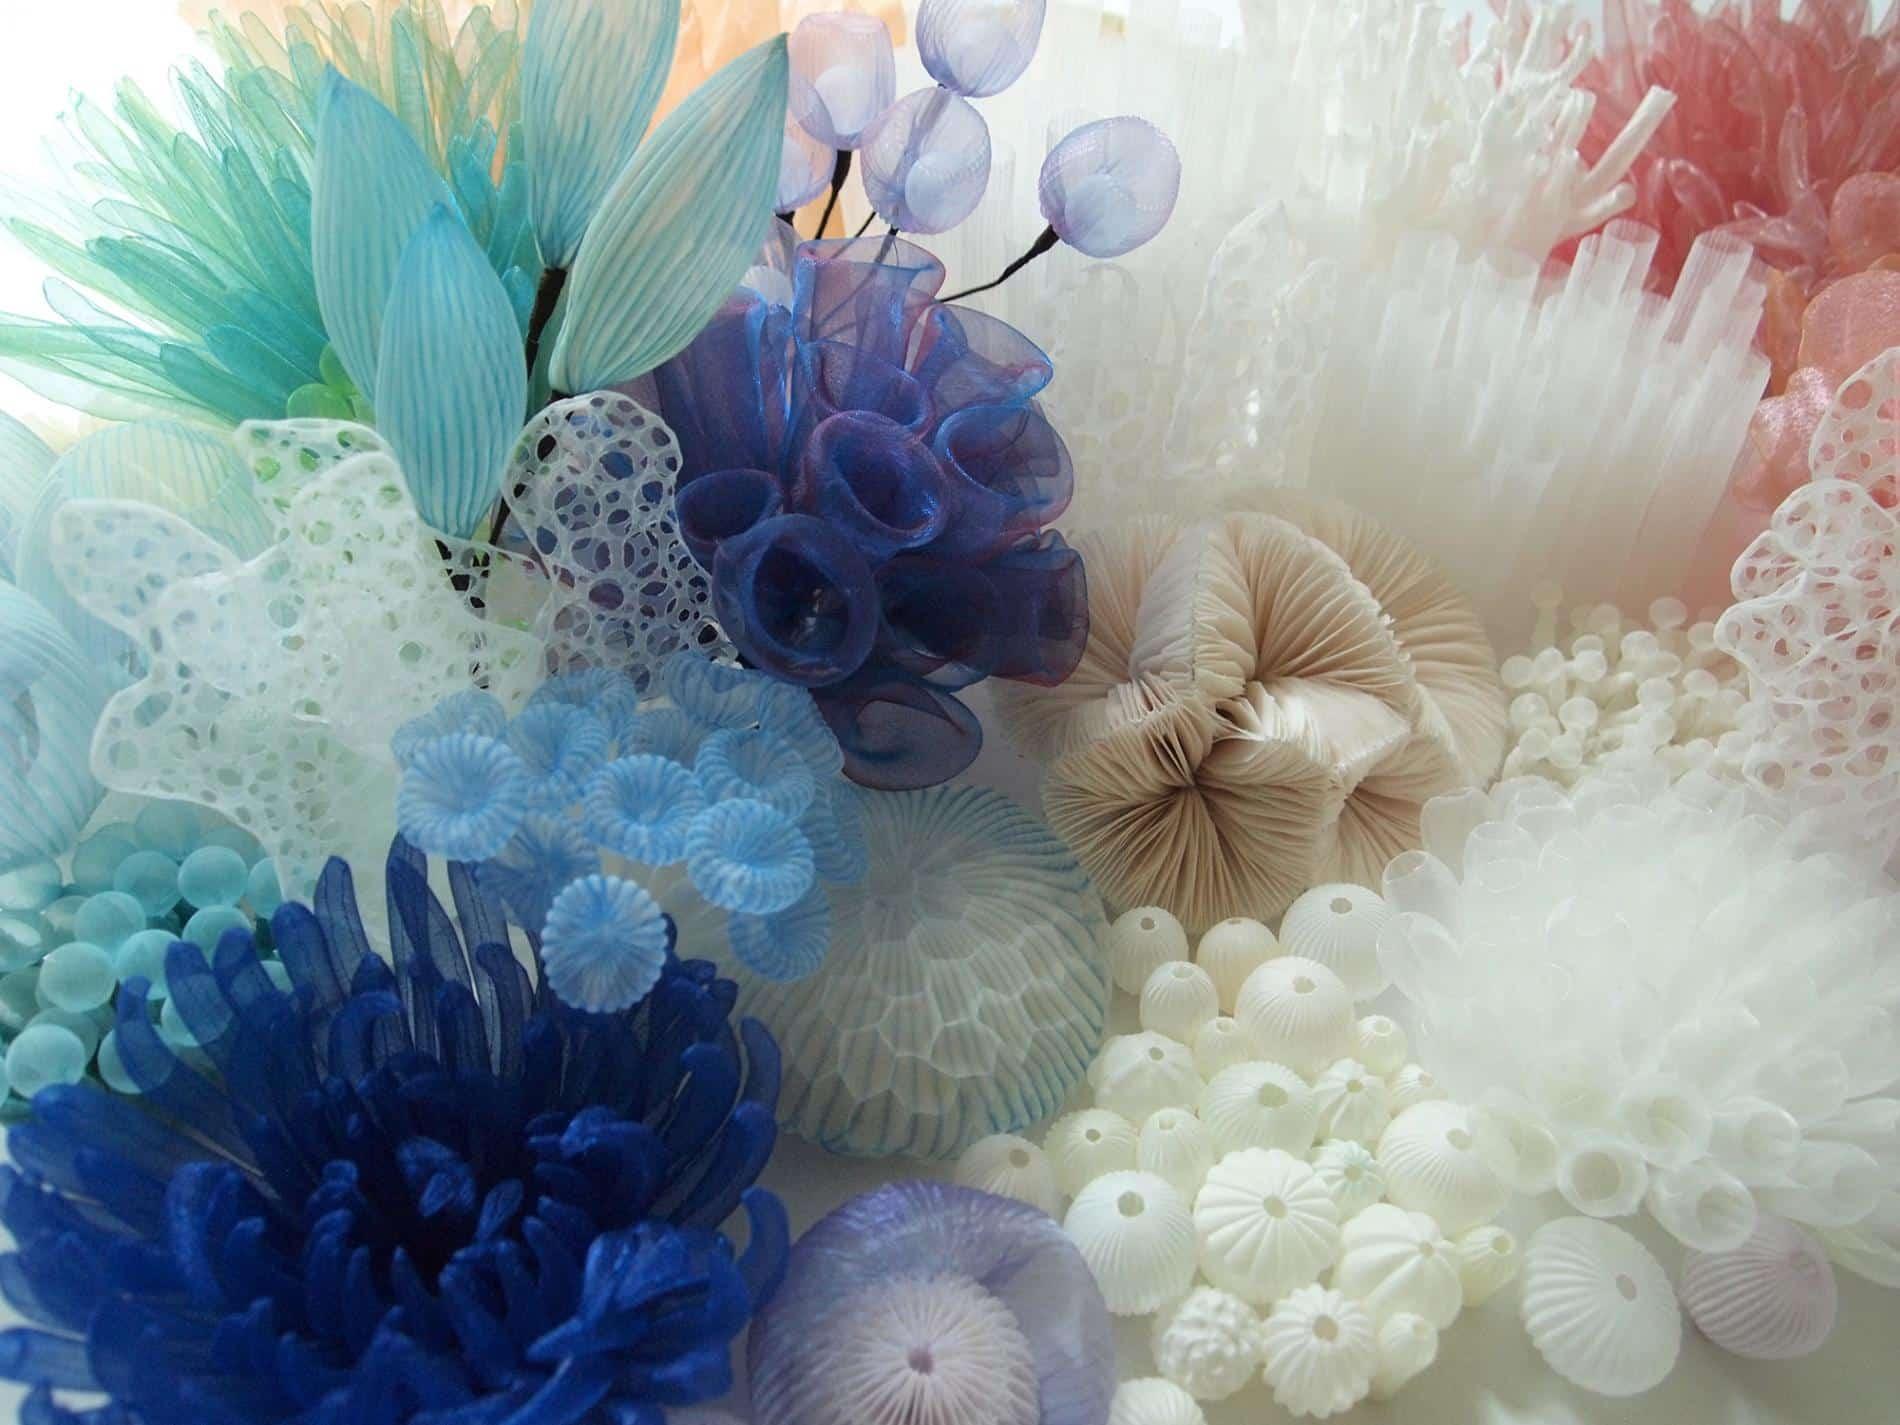 kusumoto textiles traslucidos mar